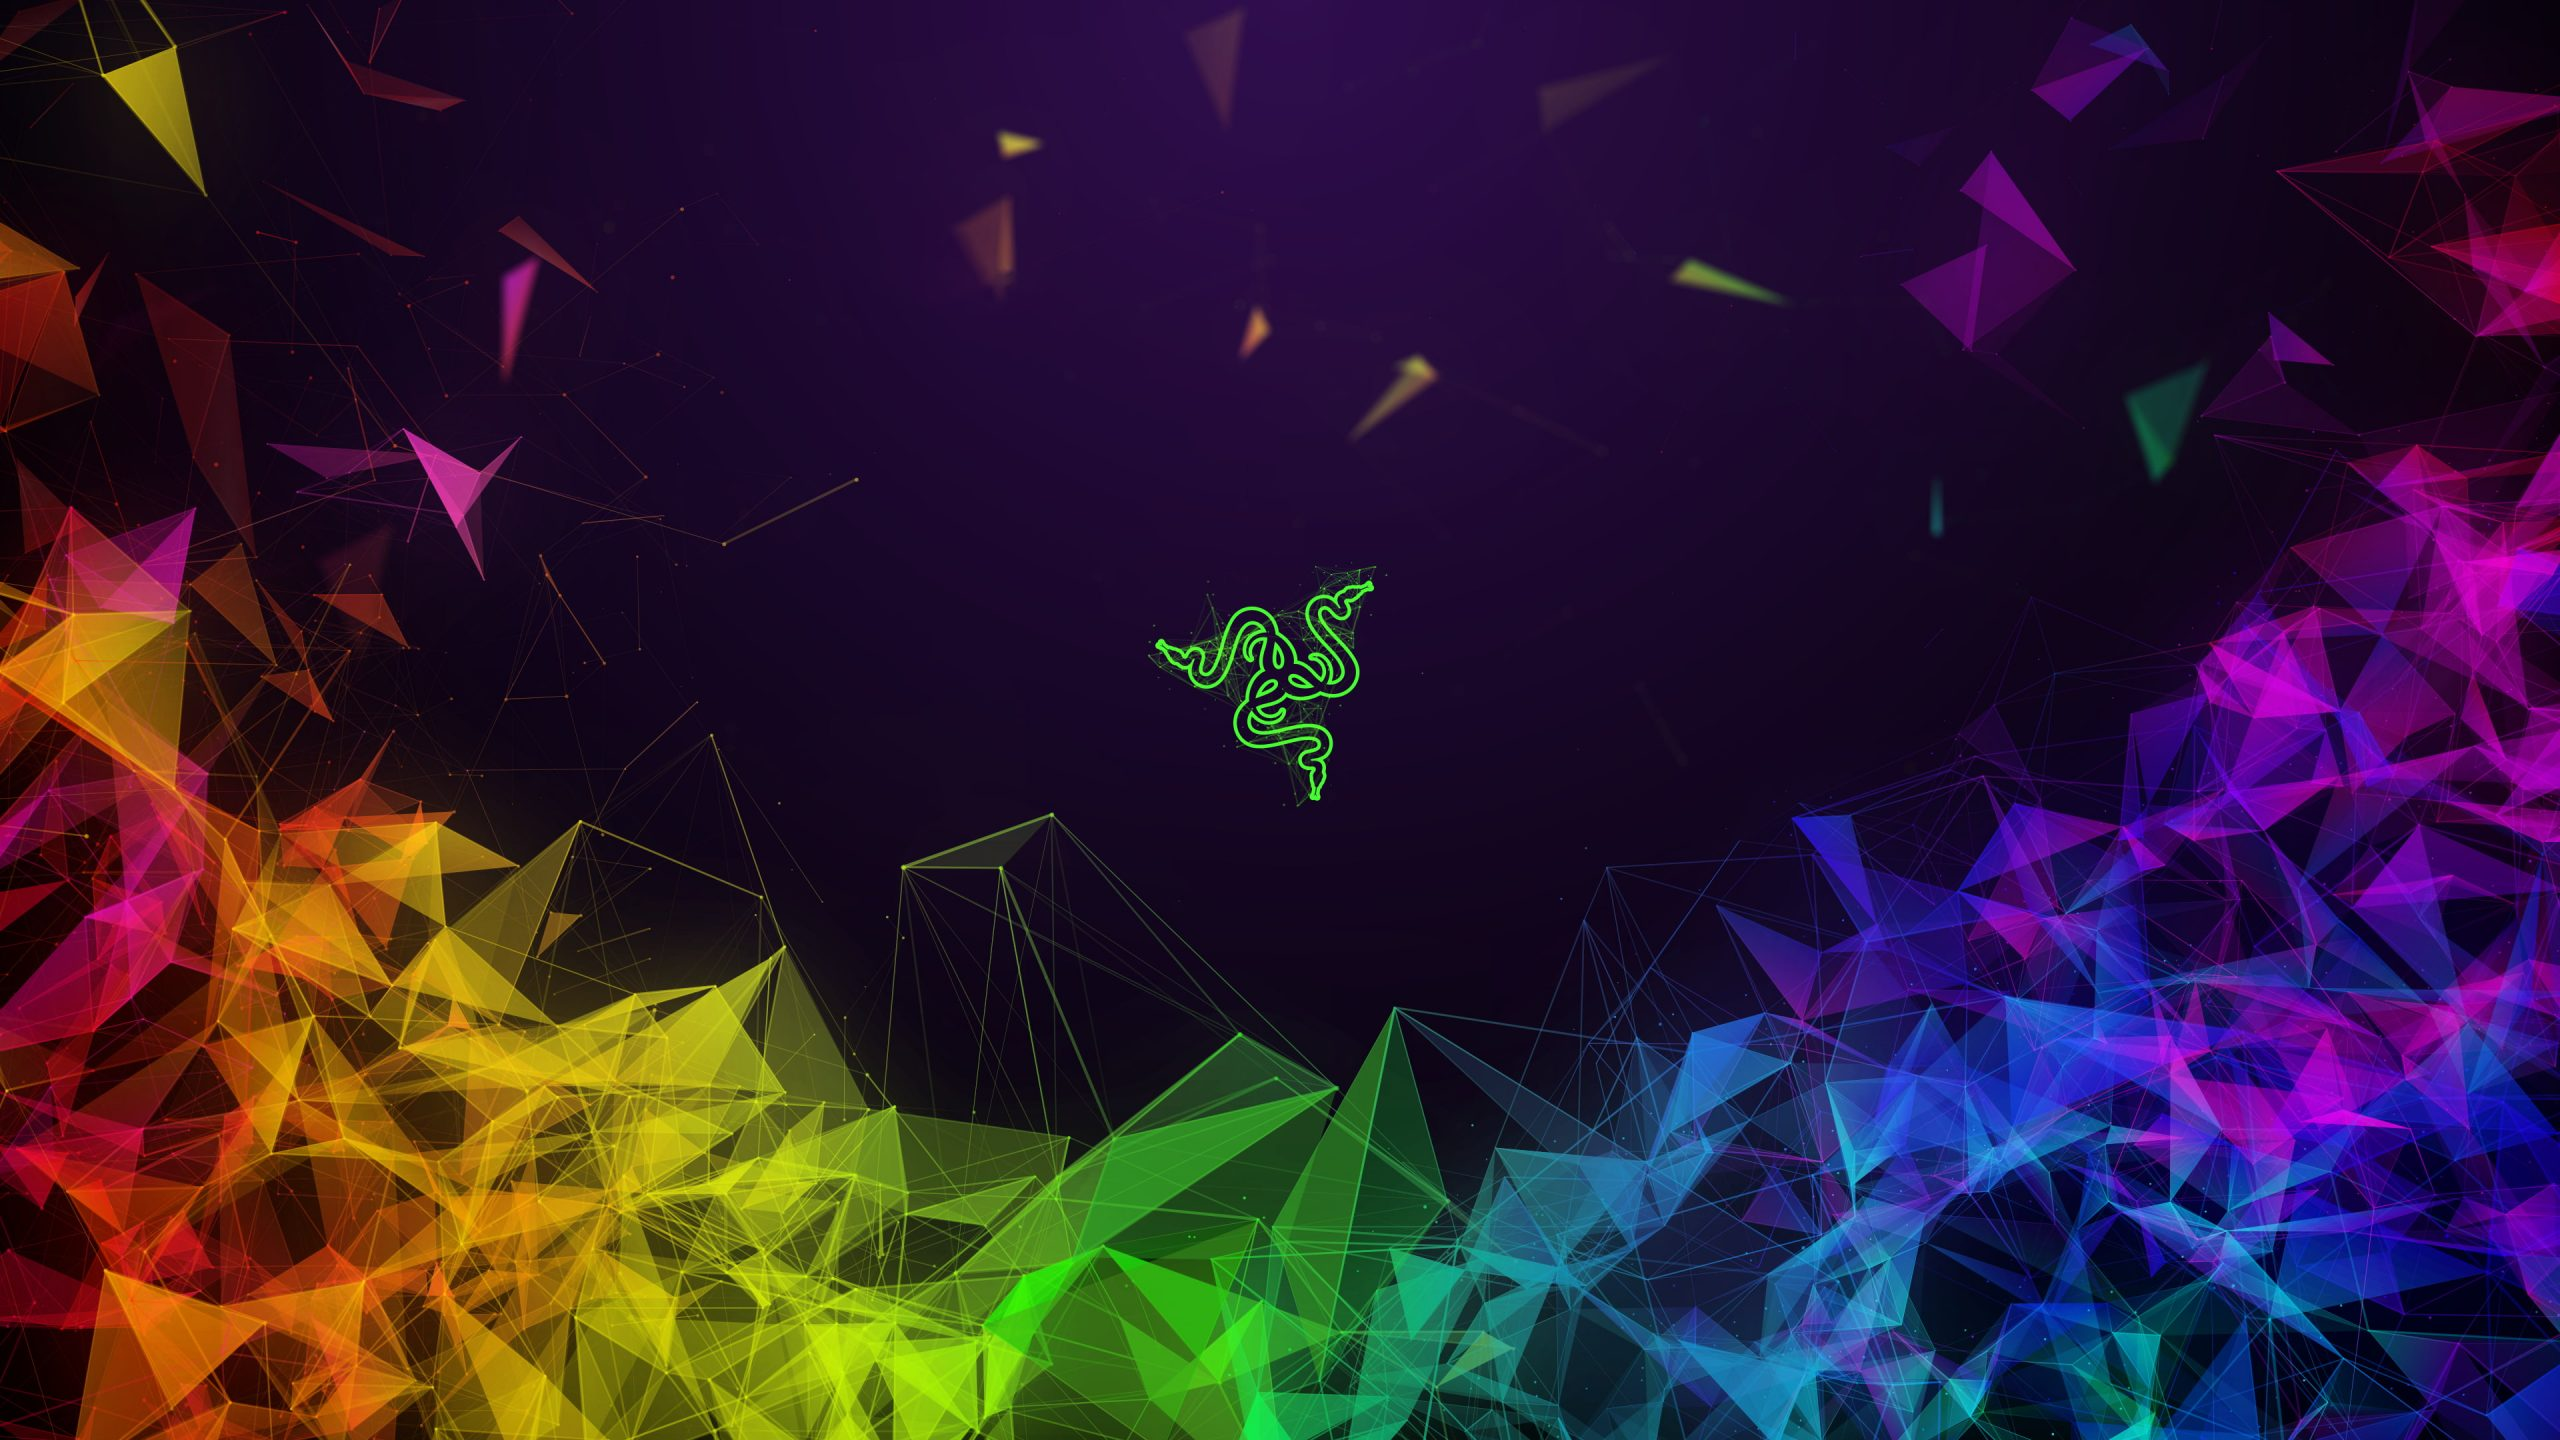 Download and discover more similar hd wallpaper on wallpapertip. Vibrant wallpaper, 4K, Colorful, Gaming Laptop, Razer